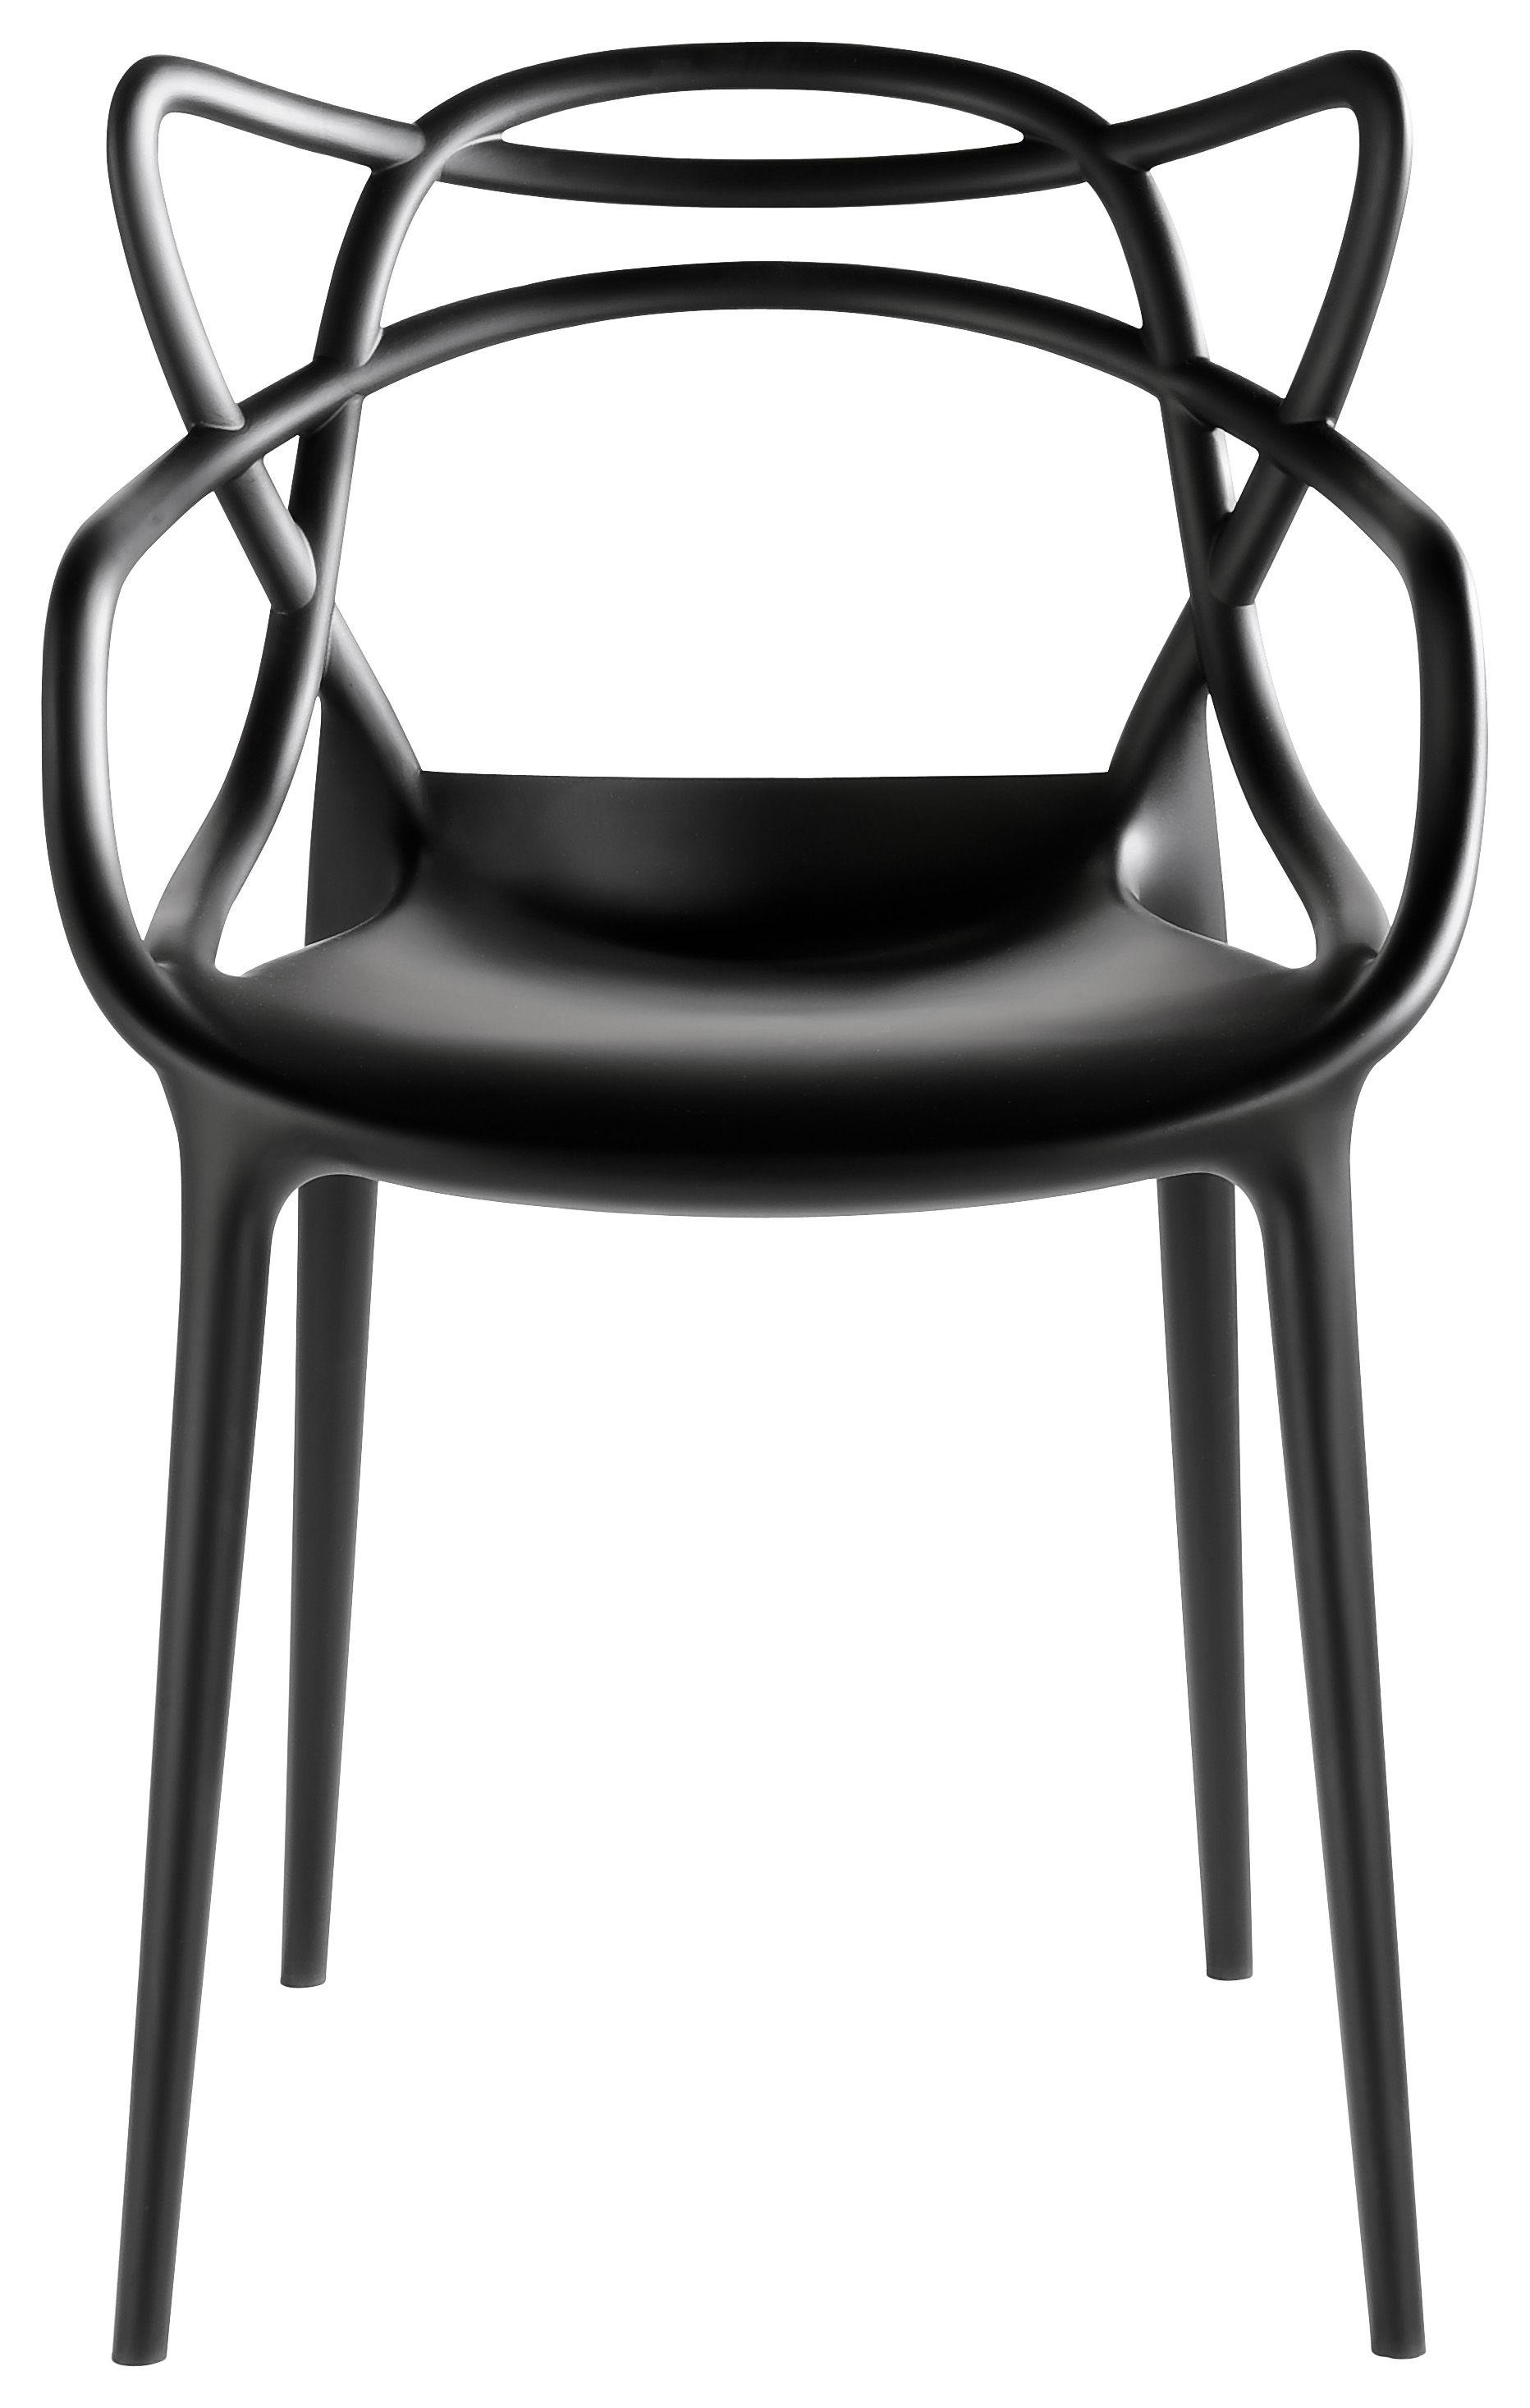 Möbel - Stühle  - Masters Stuhl- Kartell - Schwarz - Polypropylen